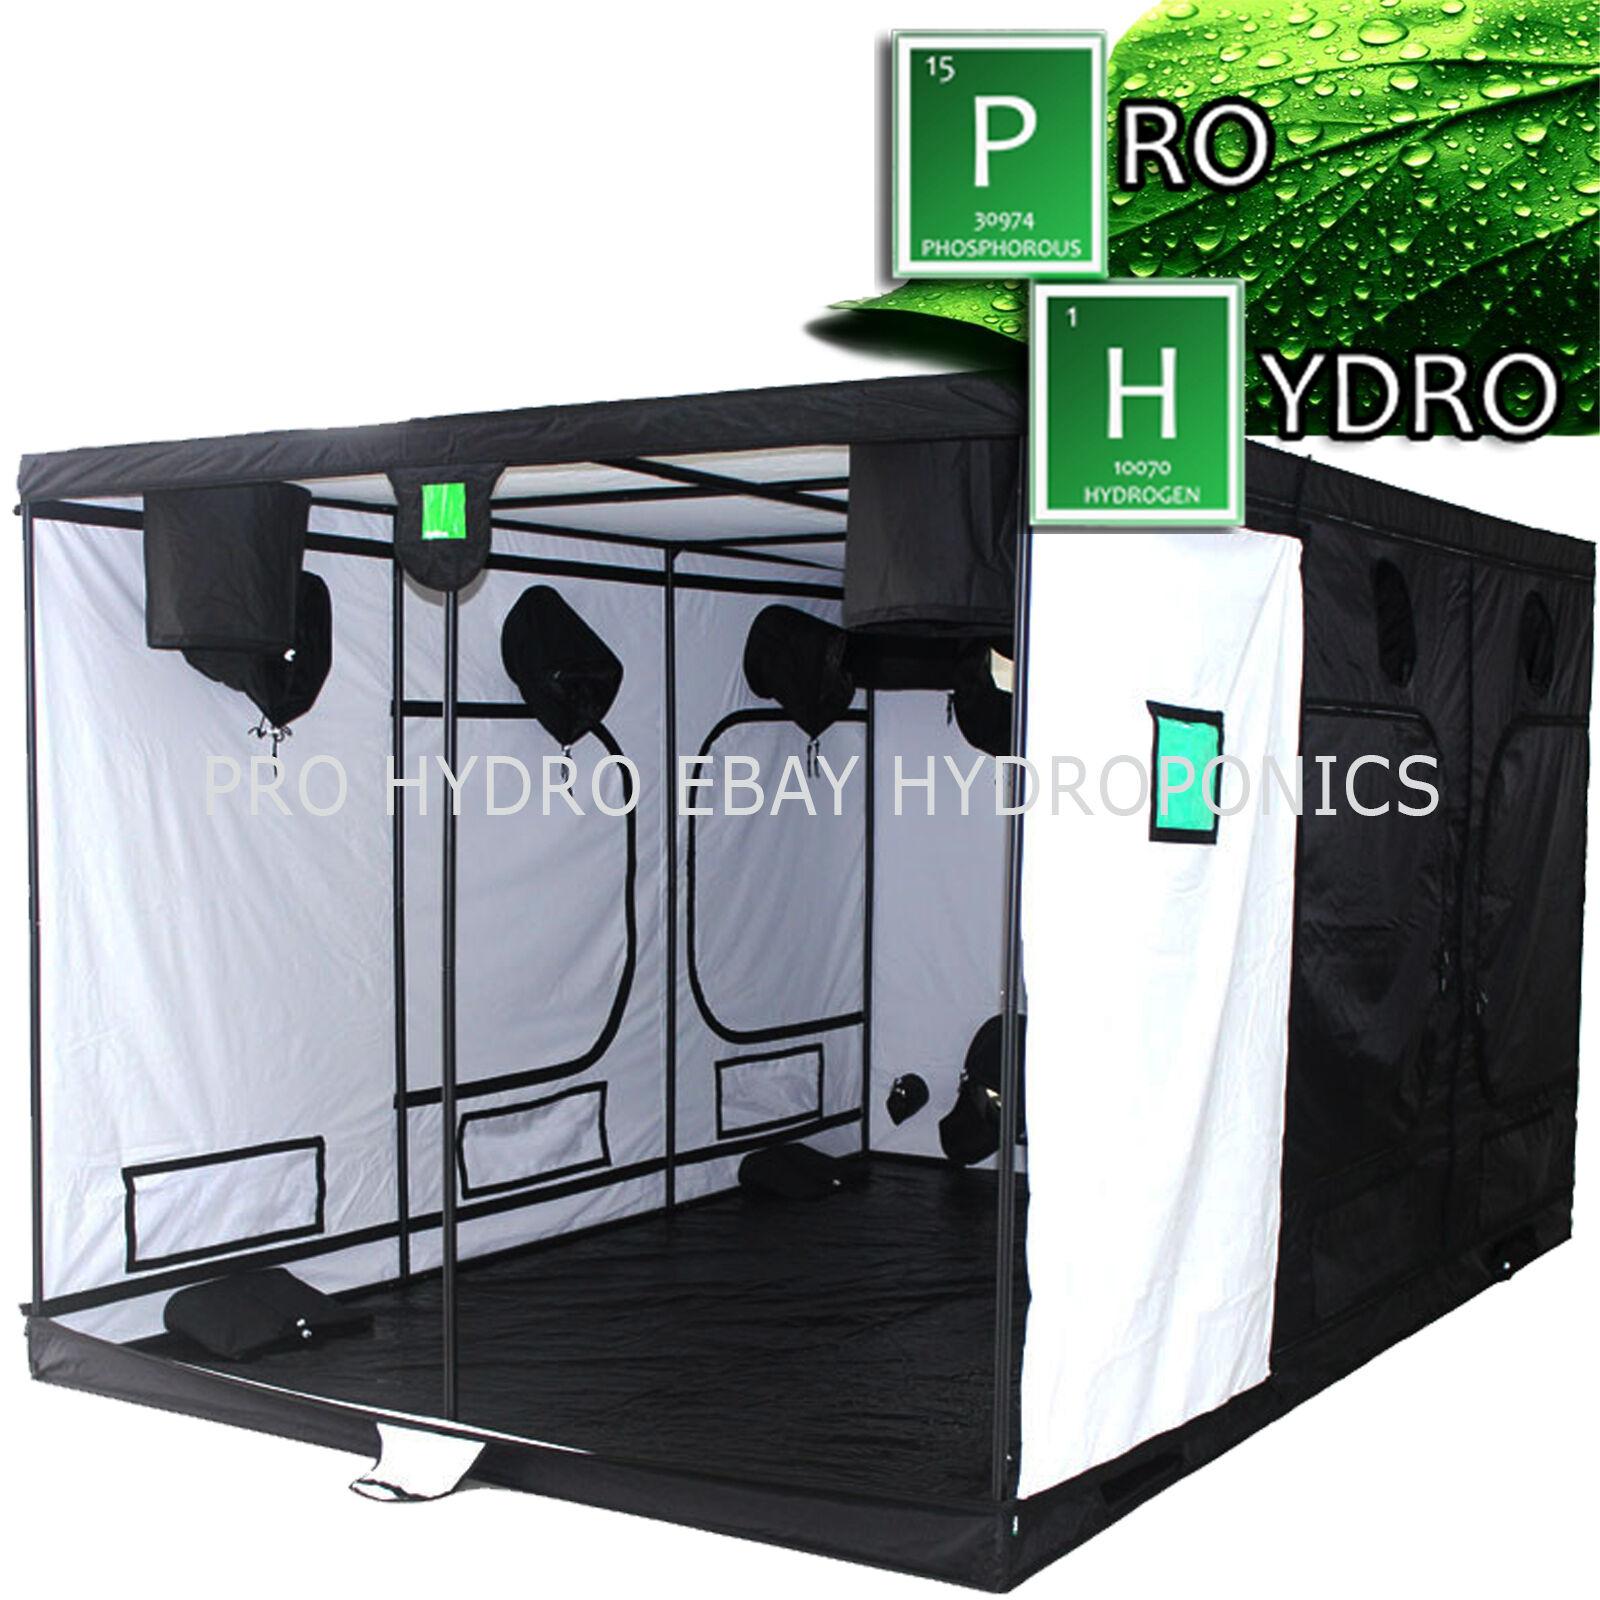 Budbox Pro 3.6m x 2,4 m x 2.0m Idroponico Riflettente Bianco Grow Room Tenda